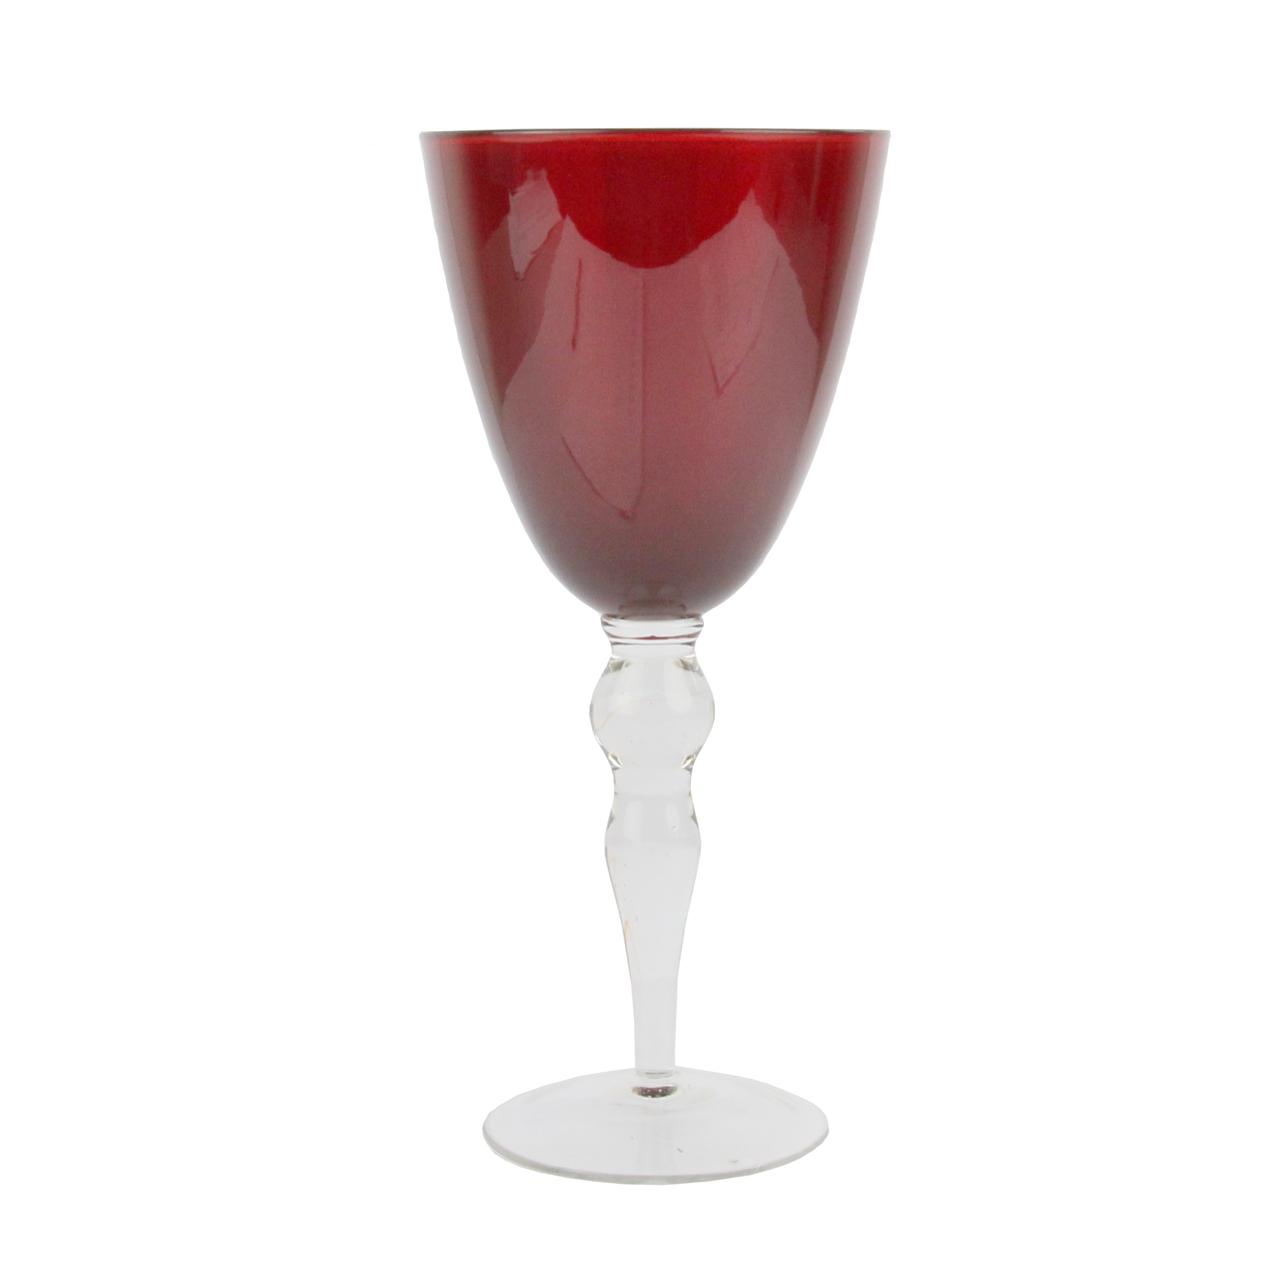 Pahar De Vin Din Sticla Rosie 20 Cm